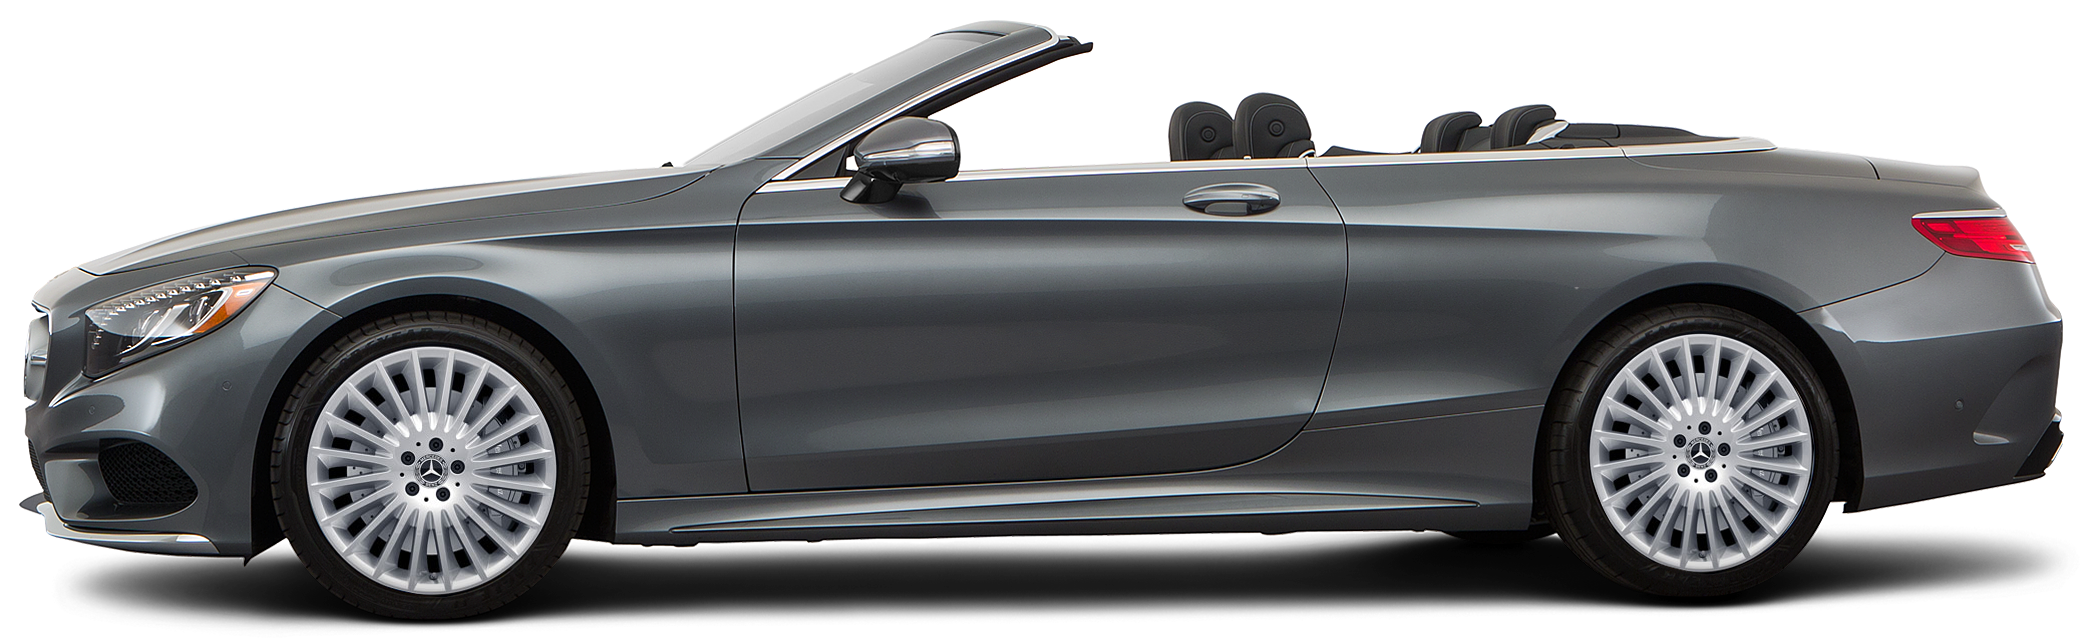 2020 Mercedes-Benz S-Class Cabriolet S 560